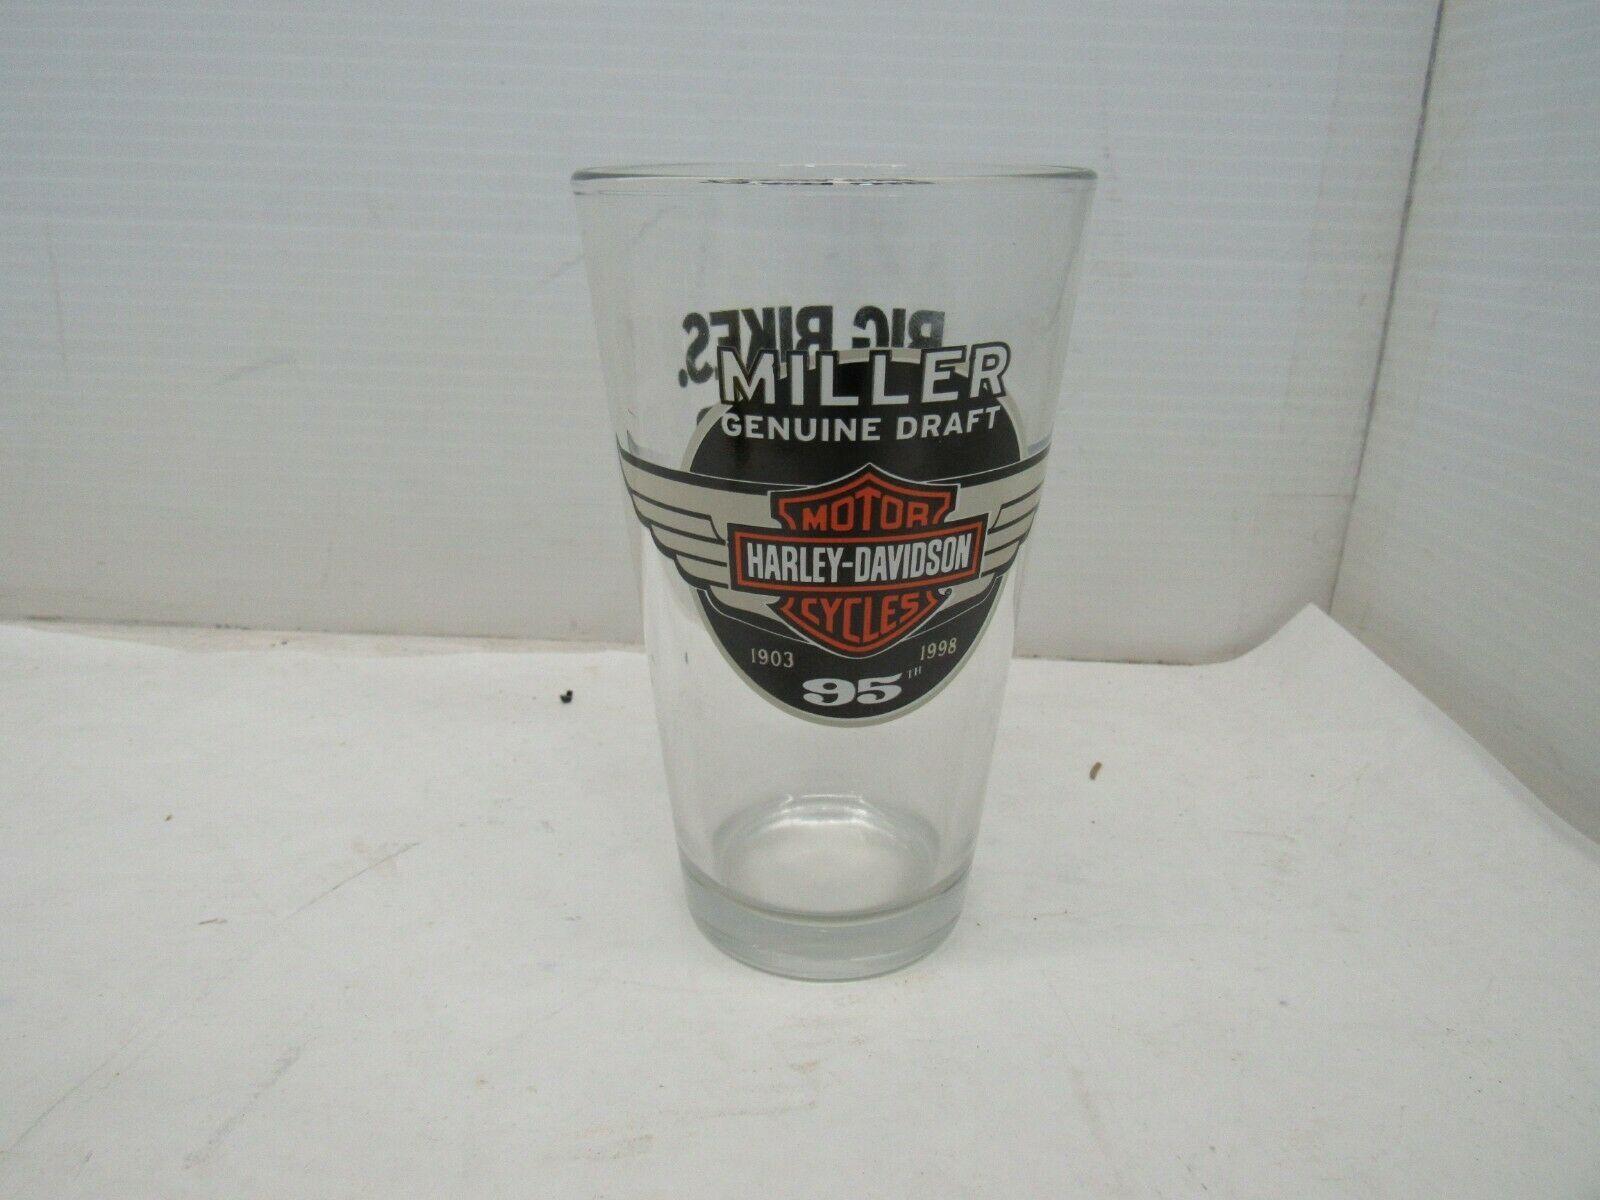 Harley Davidson Motorcycles Miller Genuine Draft 95th Anniversary Beer Glass